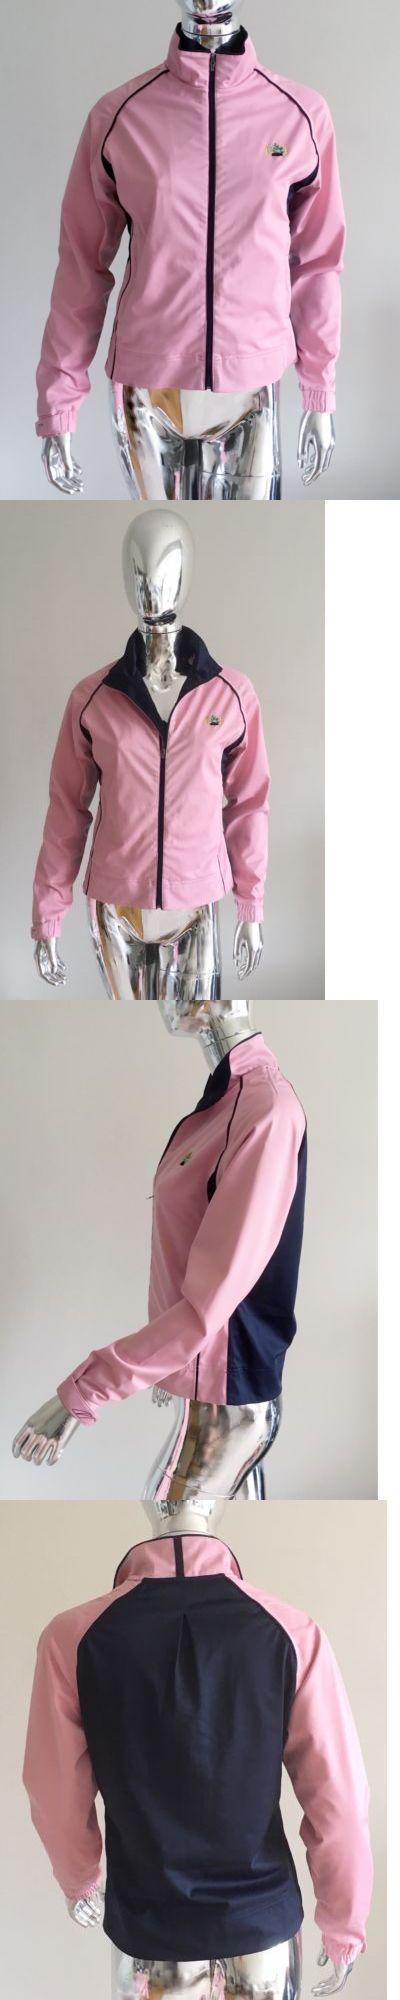 Coats and Jackets 181145: Glen Echo Women S Pink Navy Waterproof Breathable Golf Jacket W Adjust Cuffs Sz -> BUY IT NOW ONLY: $59 on eBay!